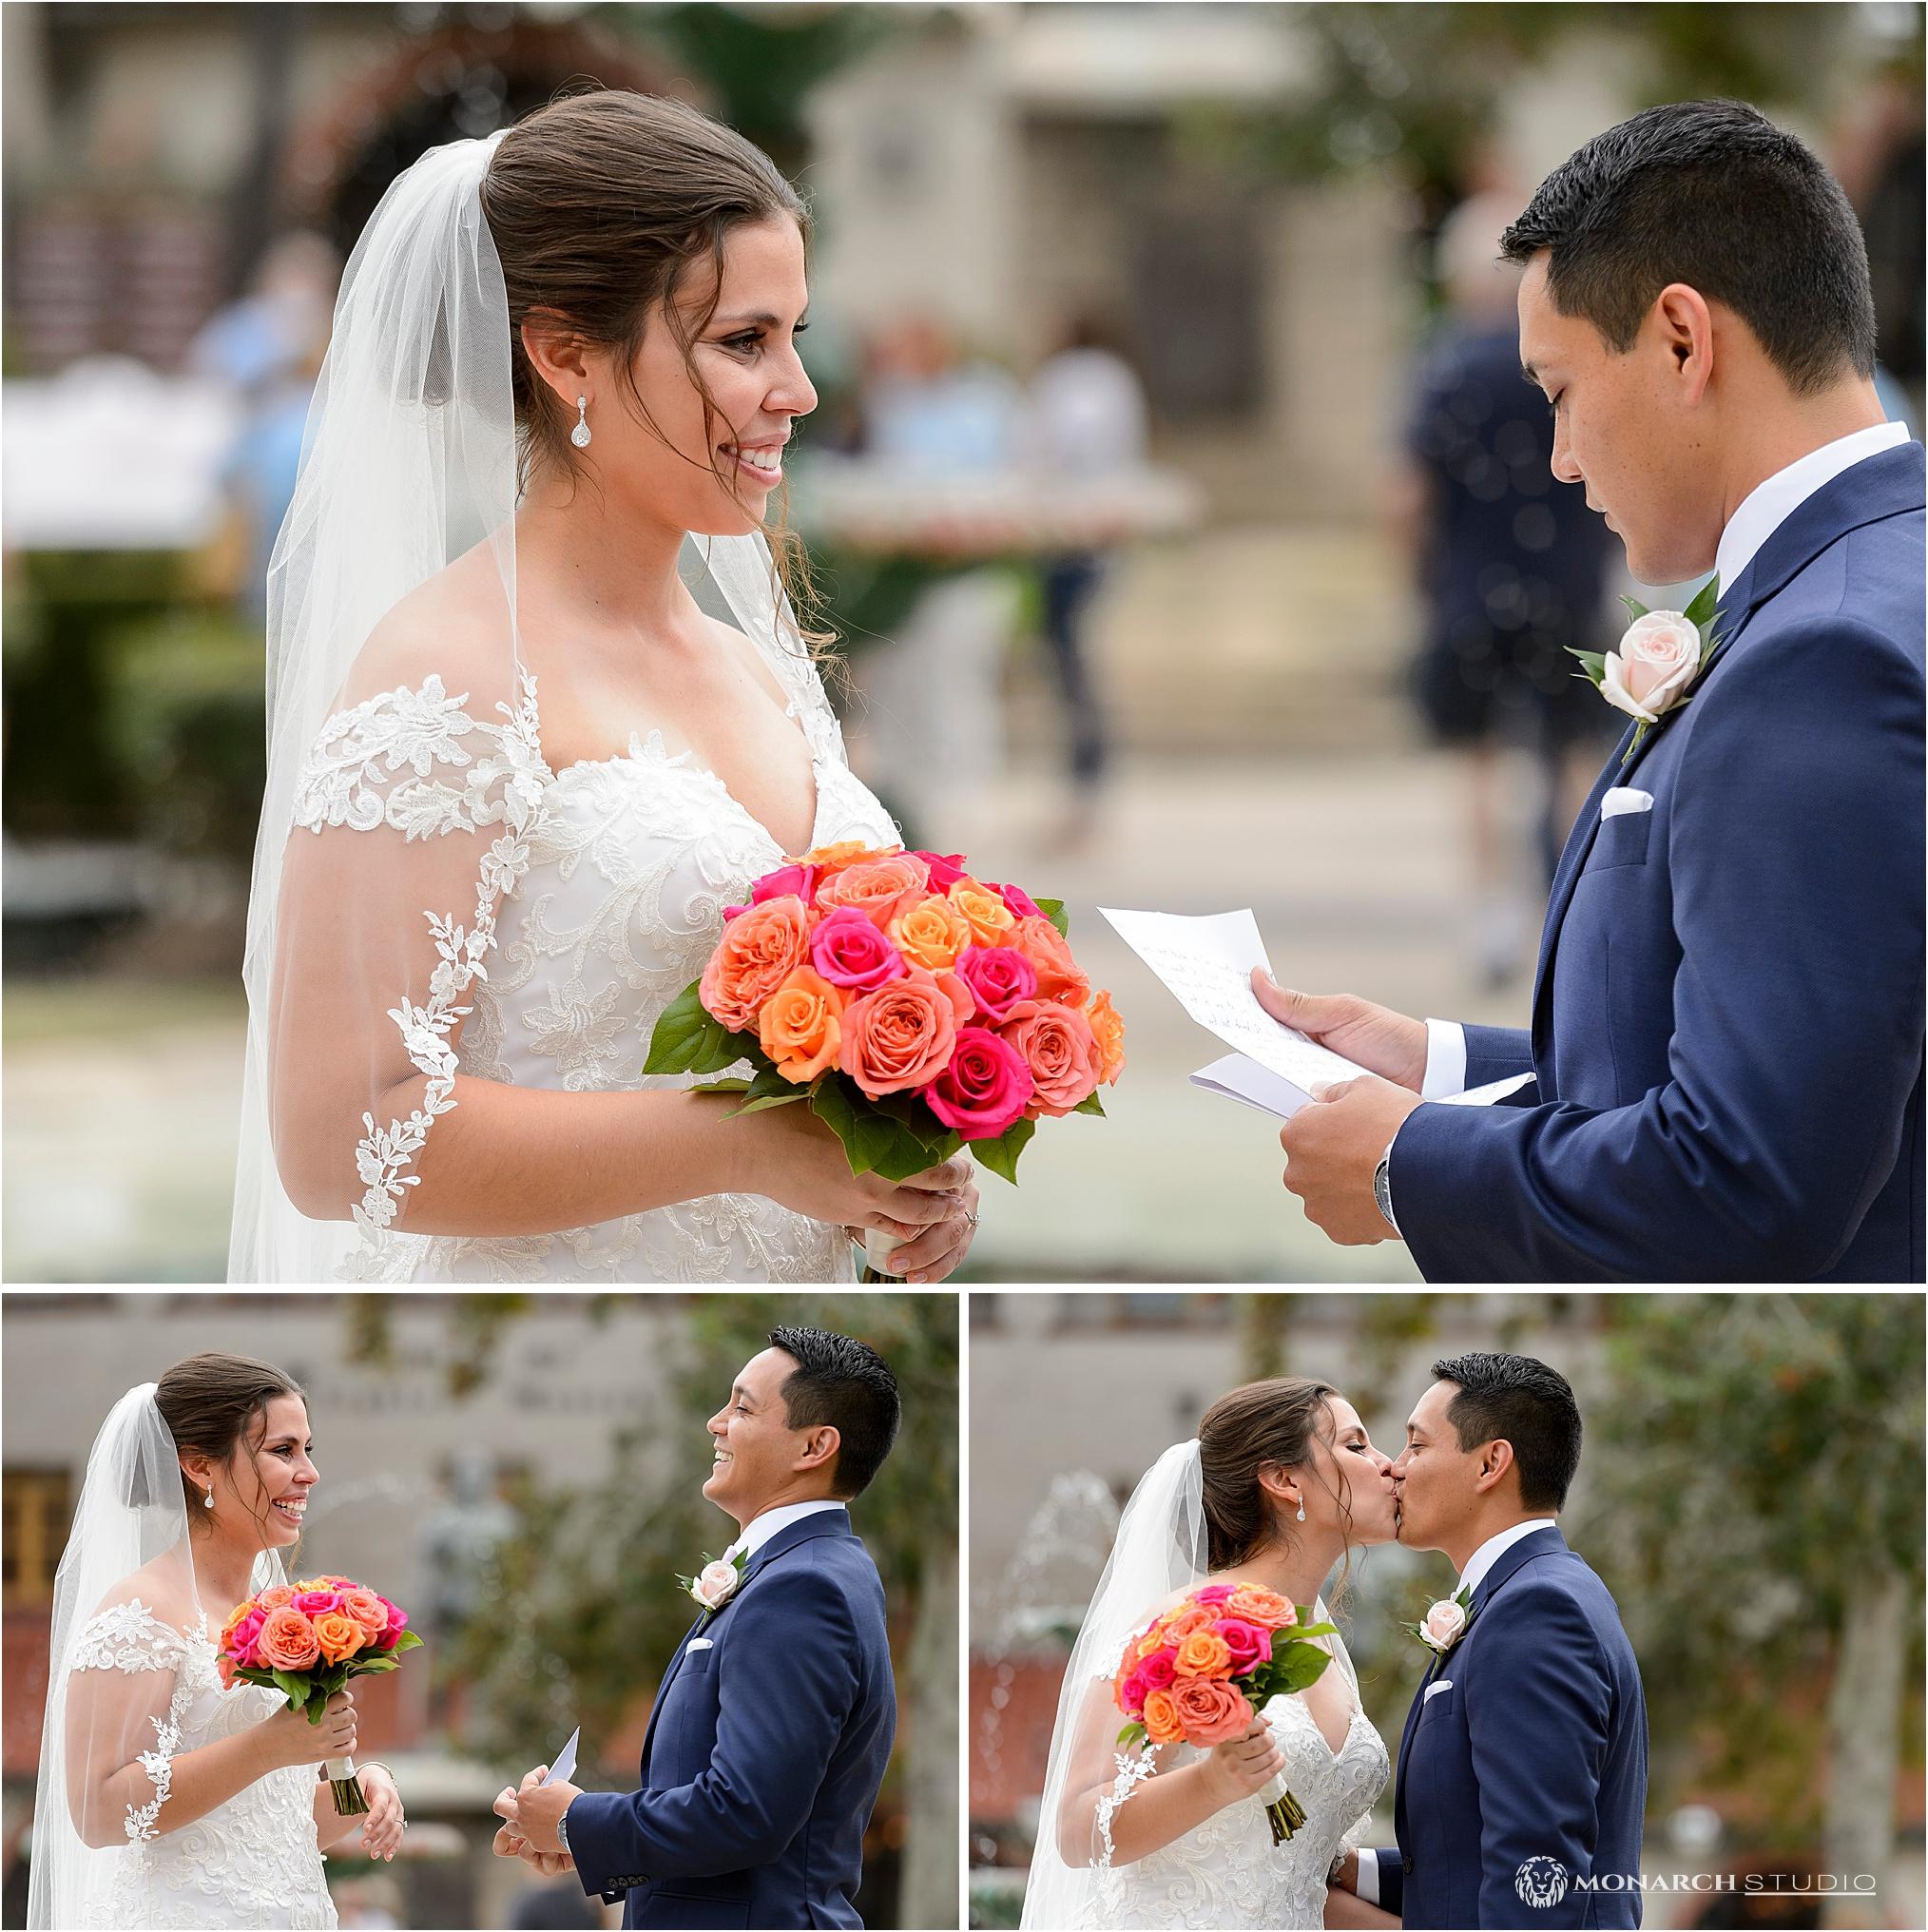 st-augustine-catholic-wedding-022.jpg